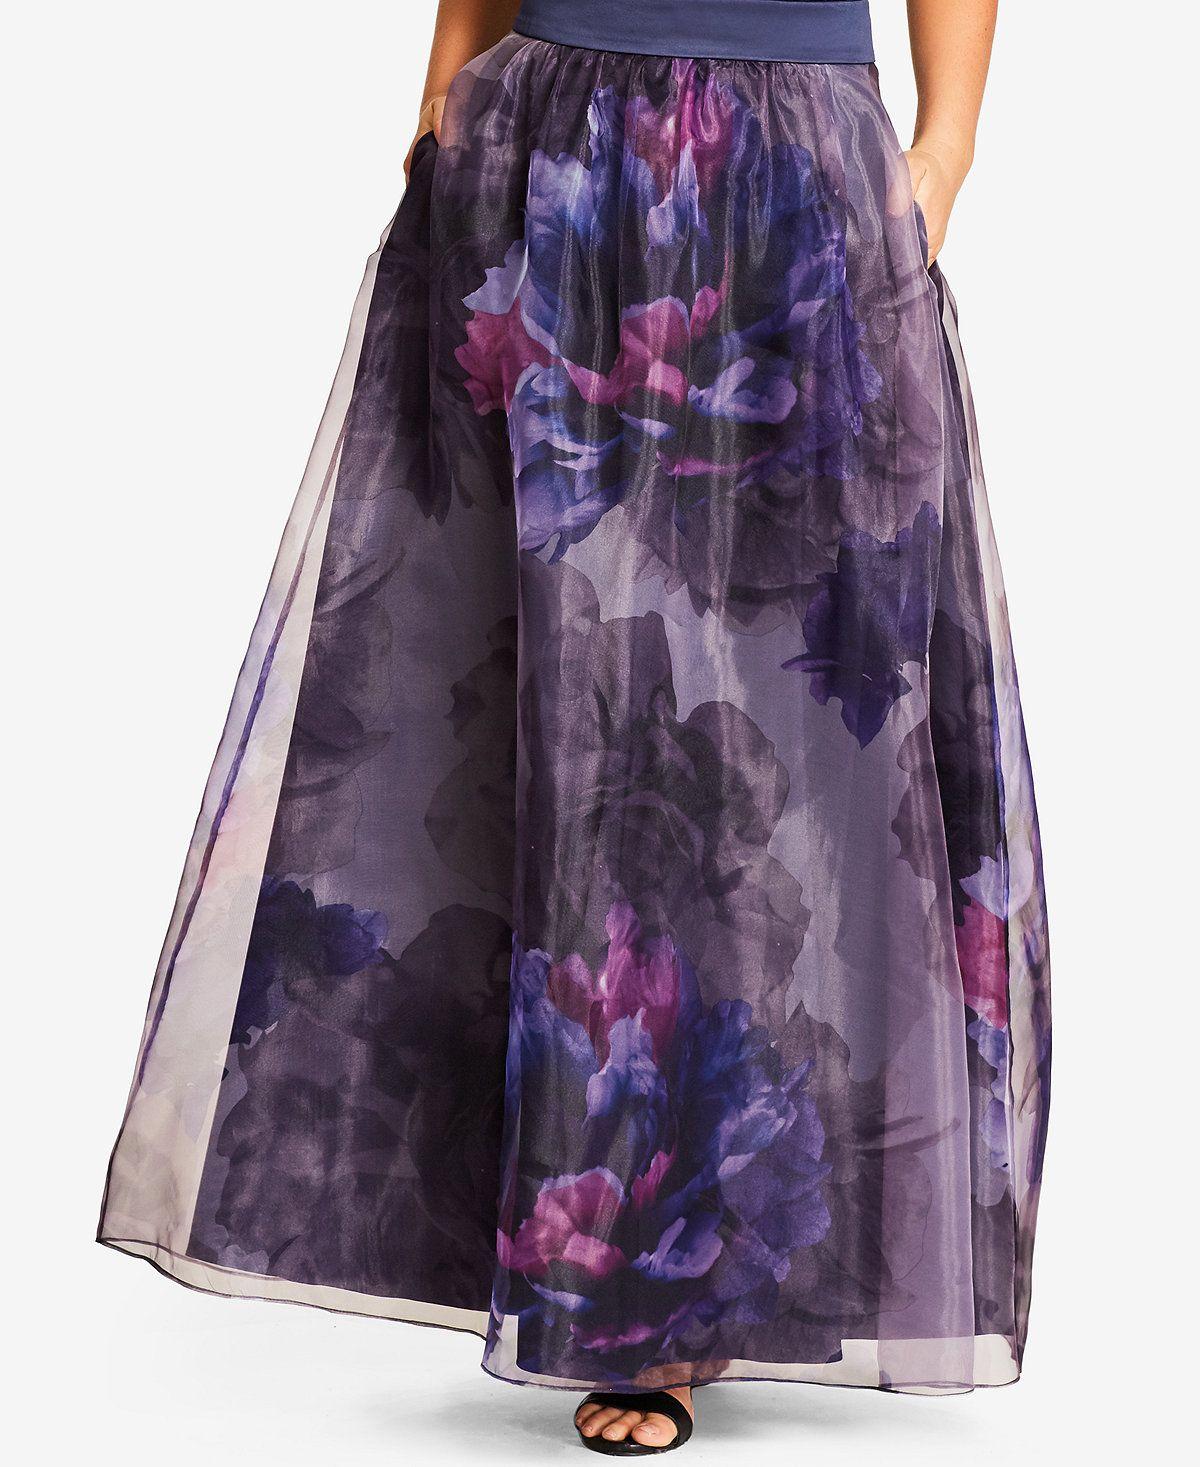 73d5df1ca4 City Chic Trendy Plus Size Floral-Print Maxi Skirt - New Arrivals - Women -  Macy's